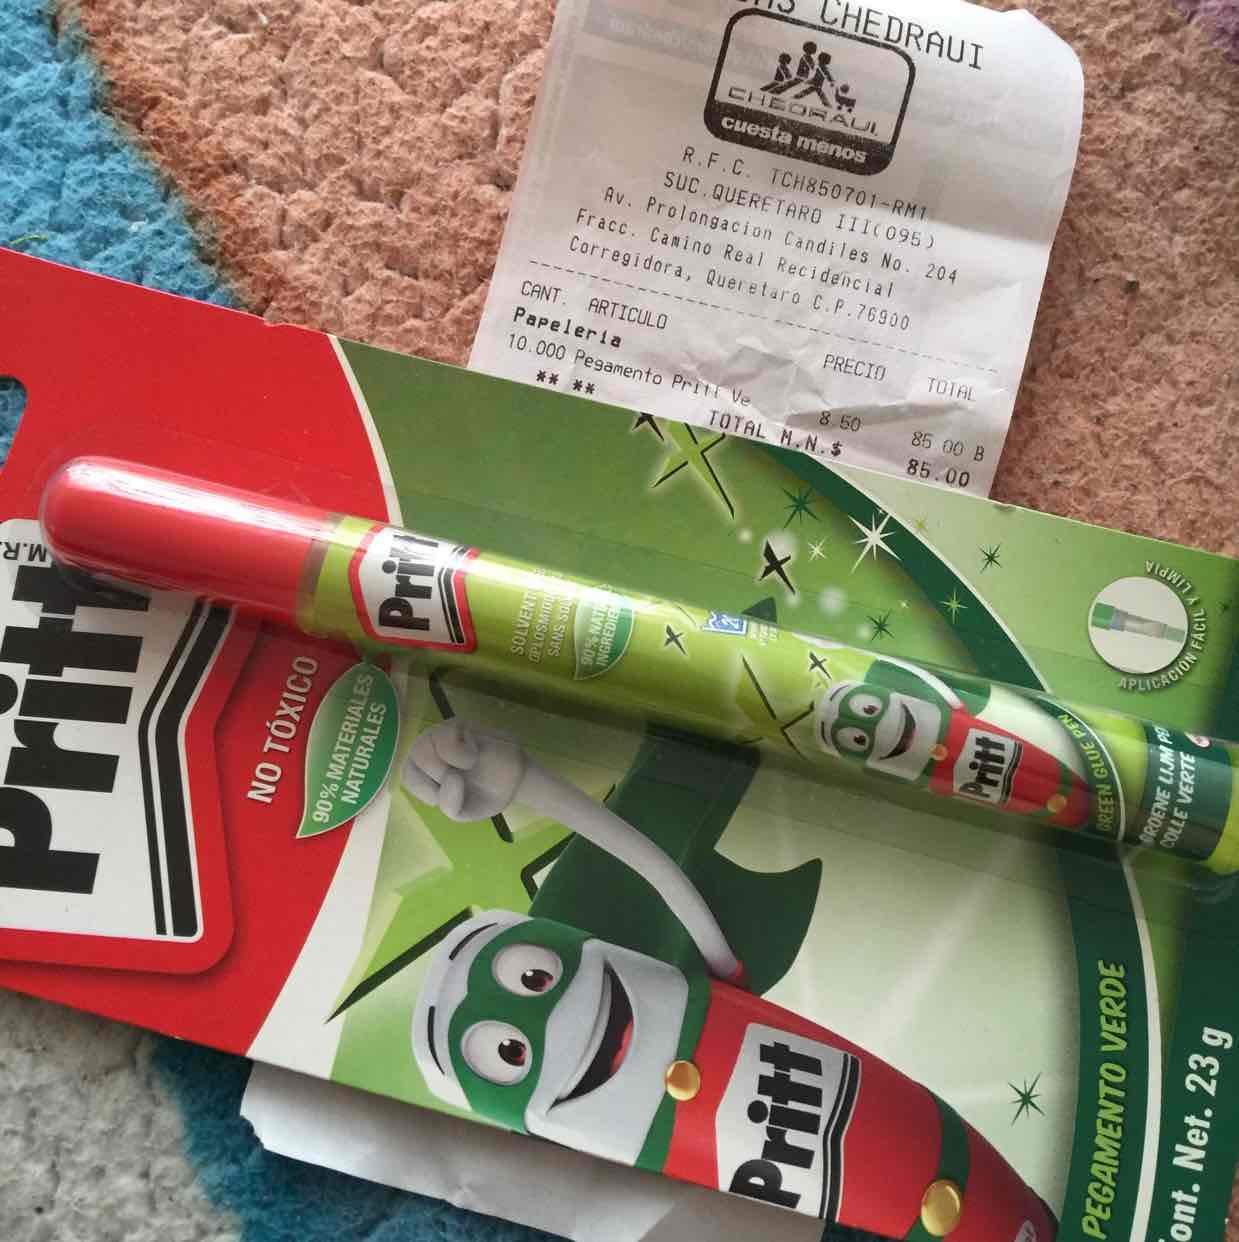 Chedraui: Pritt pluma Verde y Rosa a $8.50